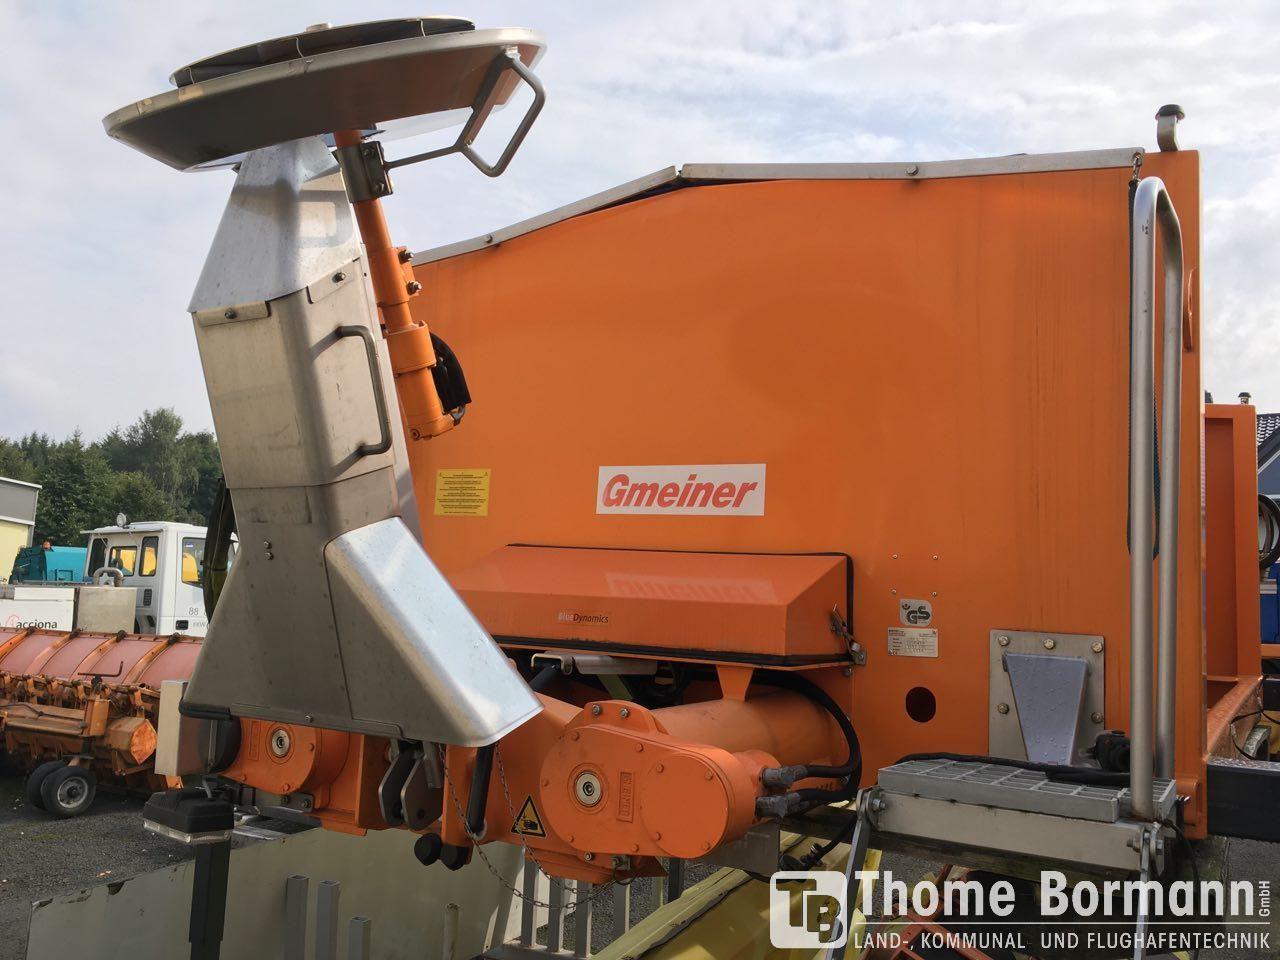 Bucher - GMeiner - Giletta - Assaloni - McDonald Icebear 5000 W